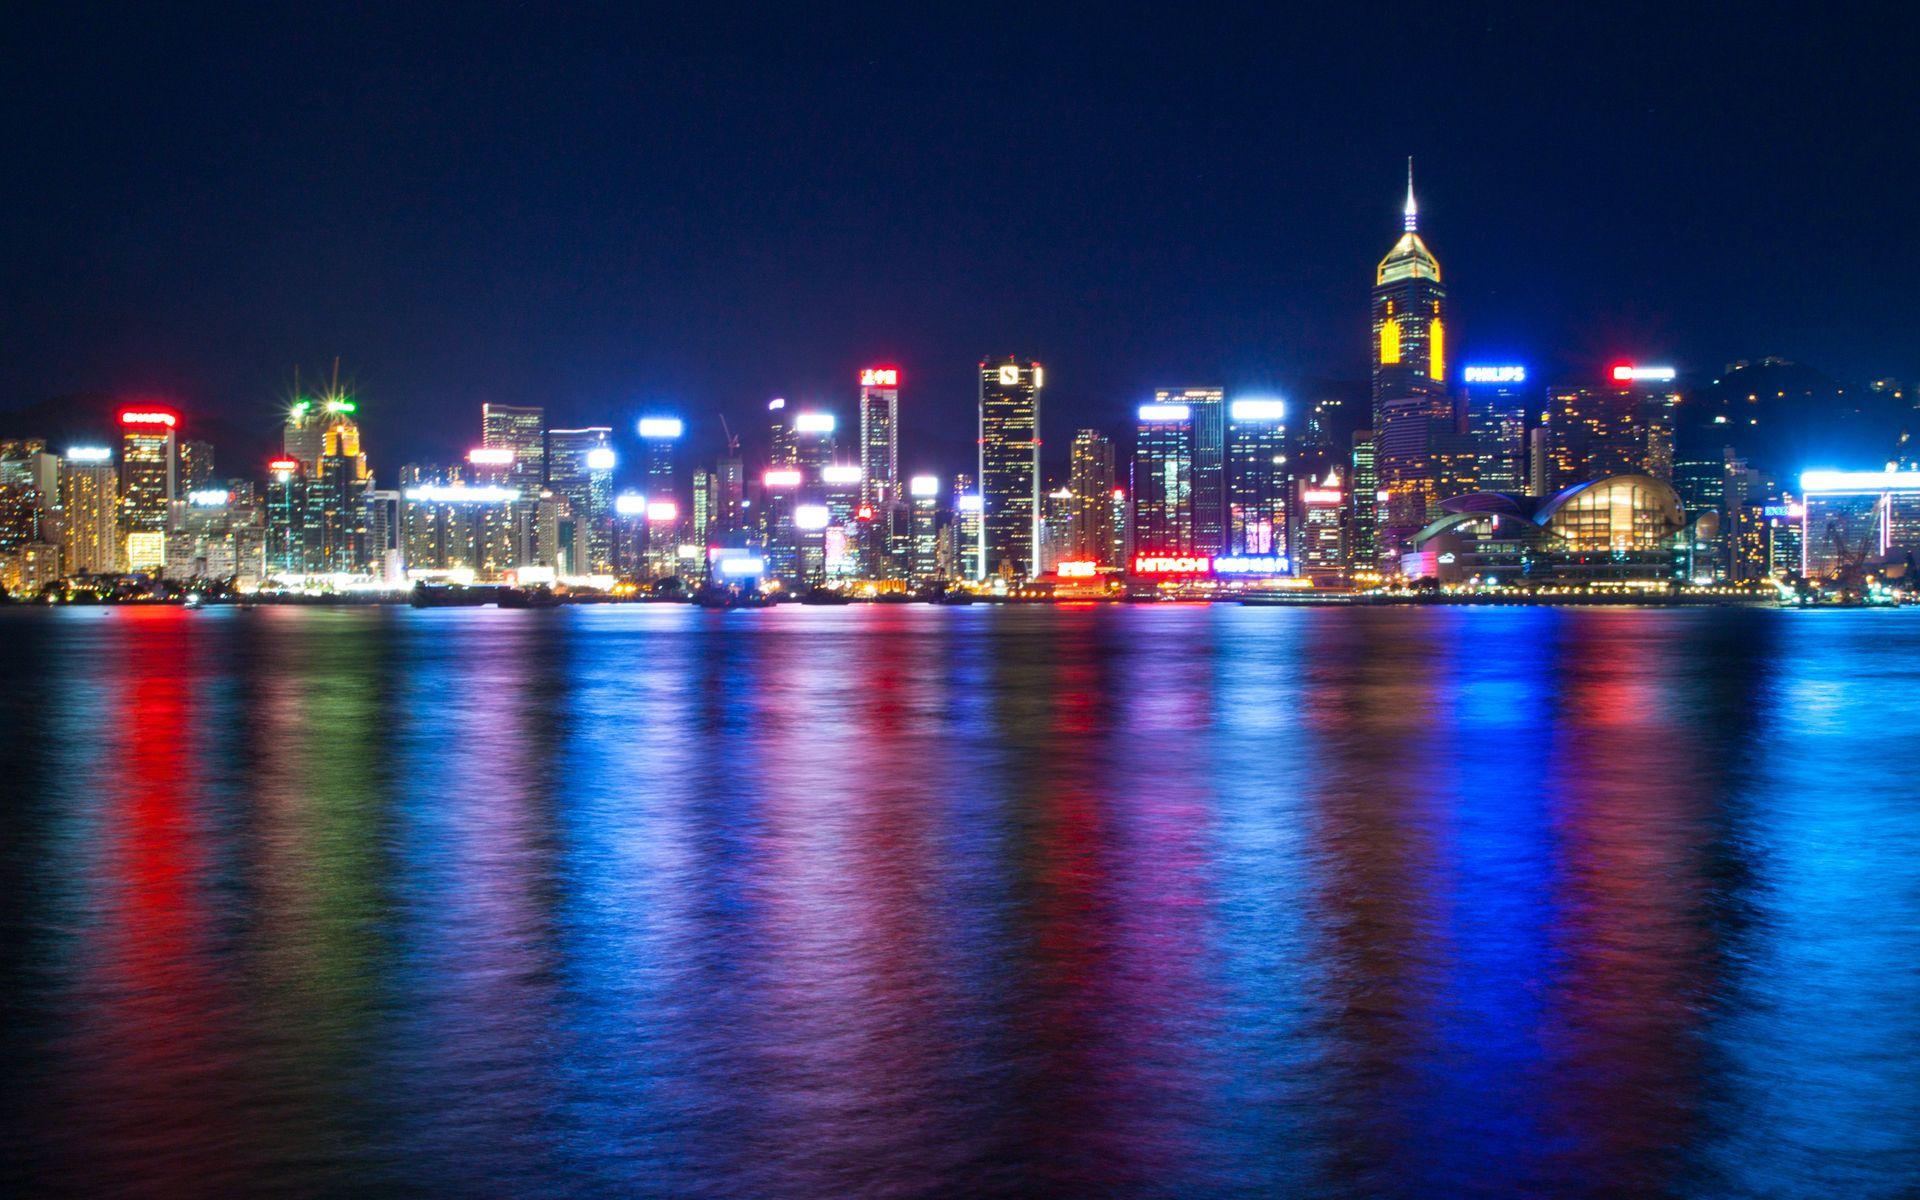 Explore And Share Night City Wallpaper City Desktop Best Hd Wallpapers City Wallpaper Night City Cityscape